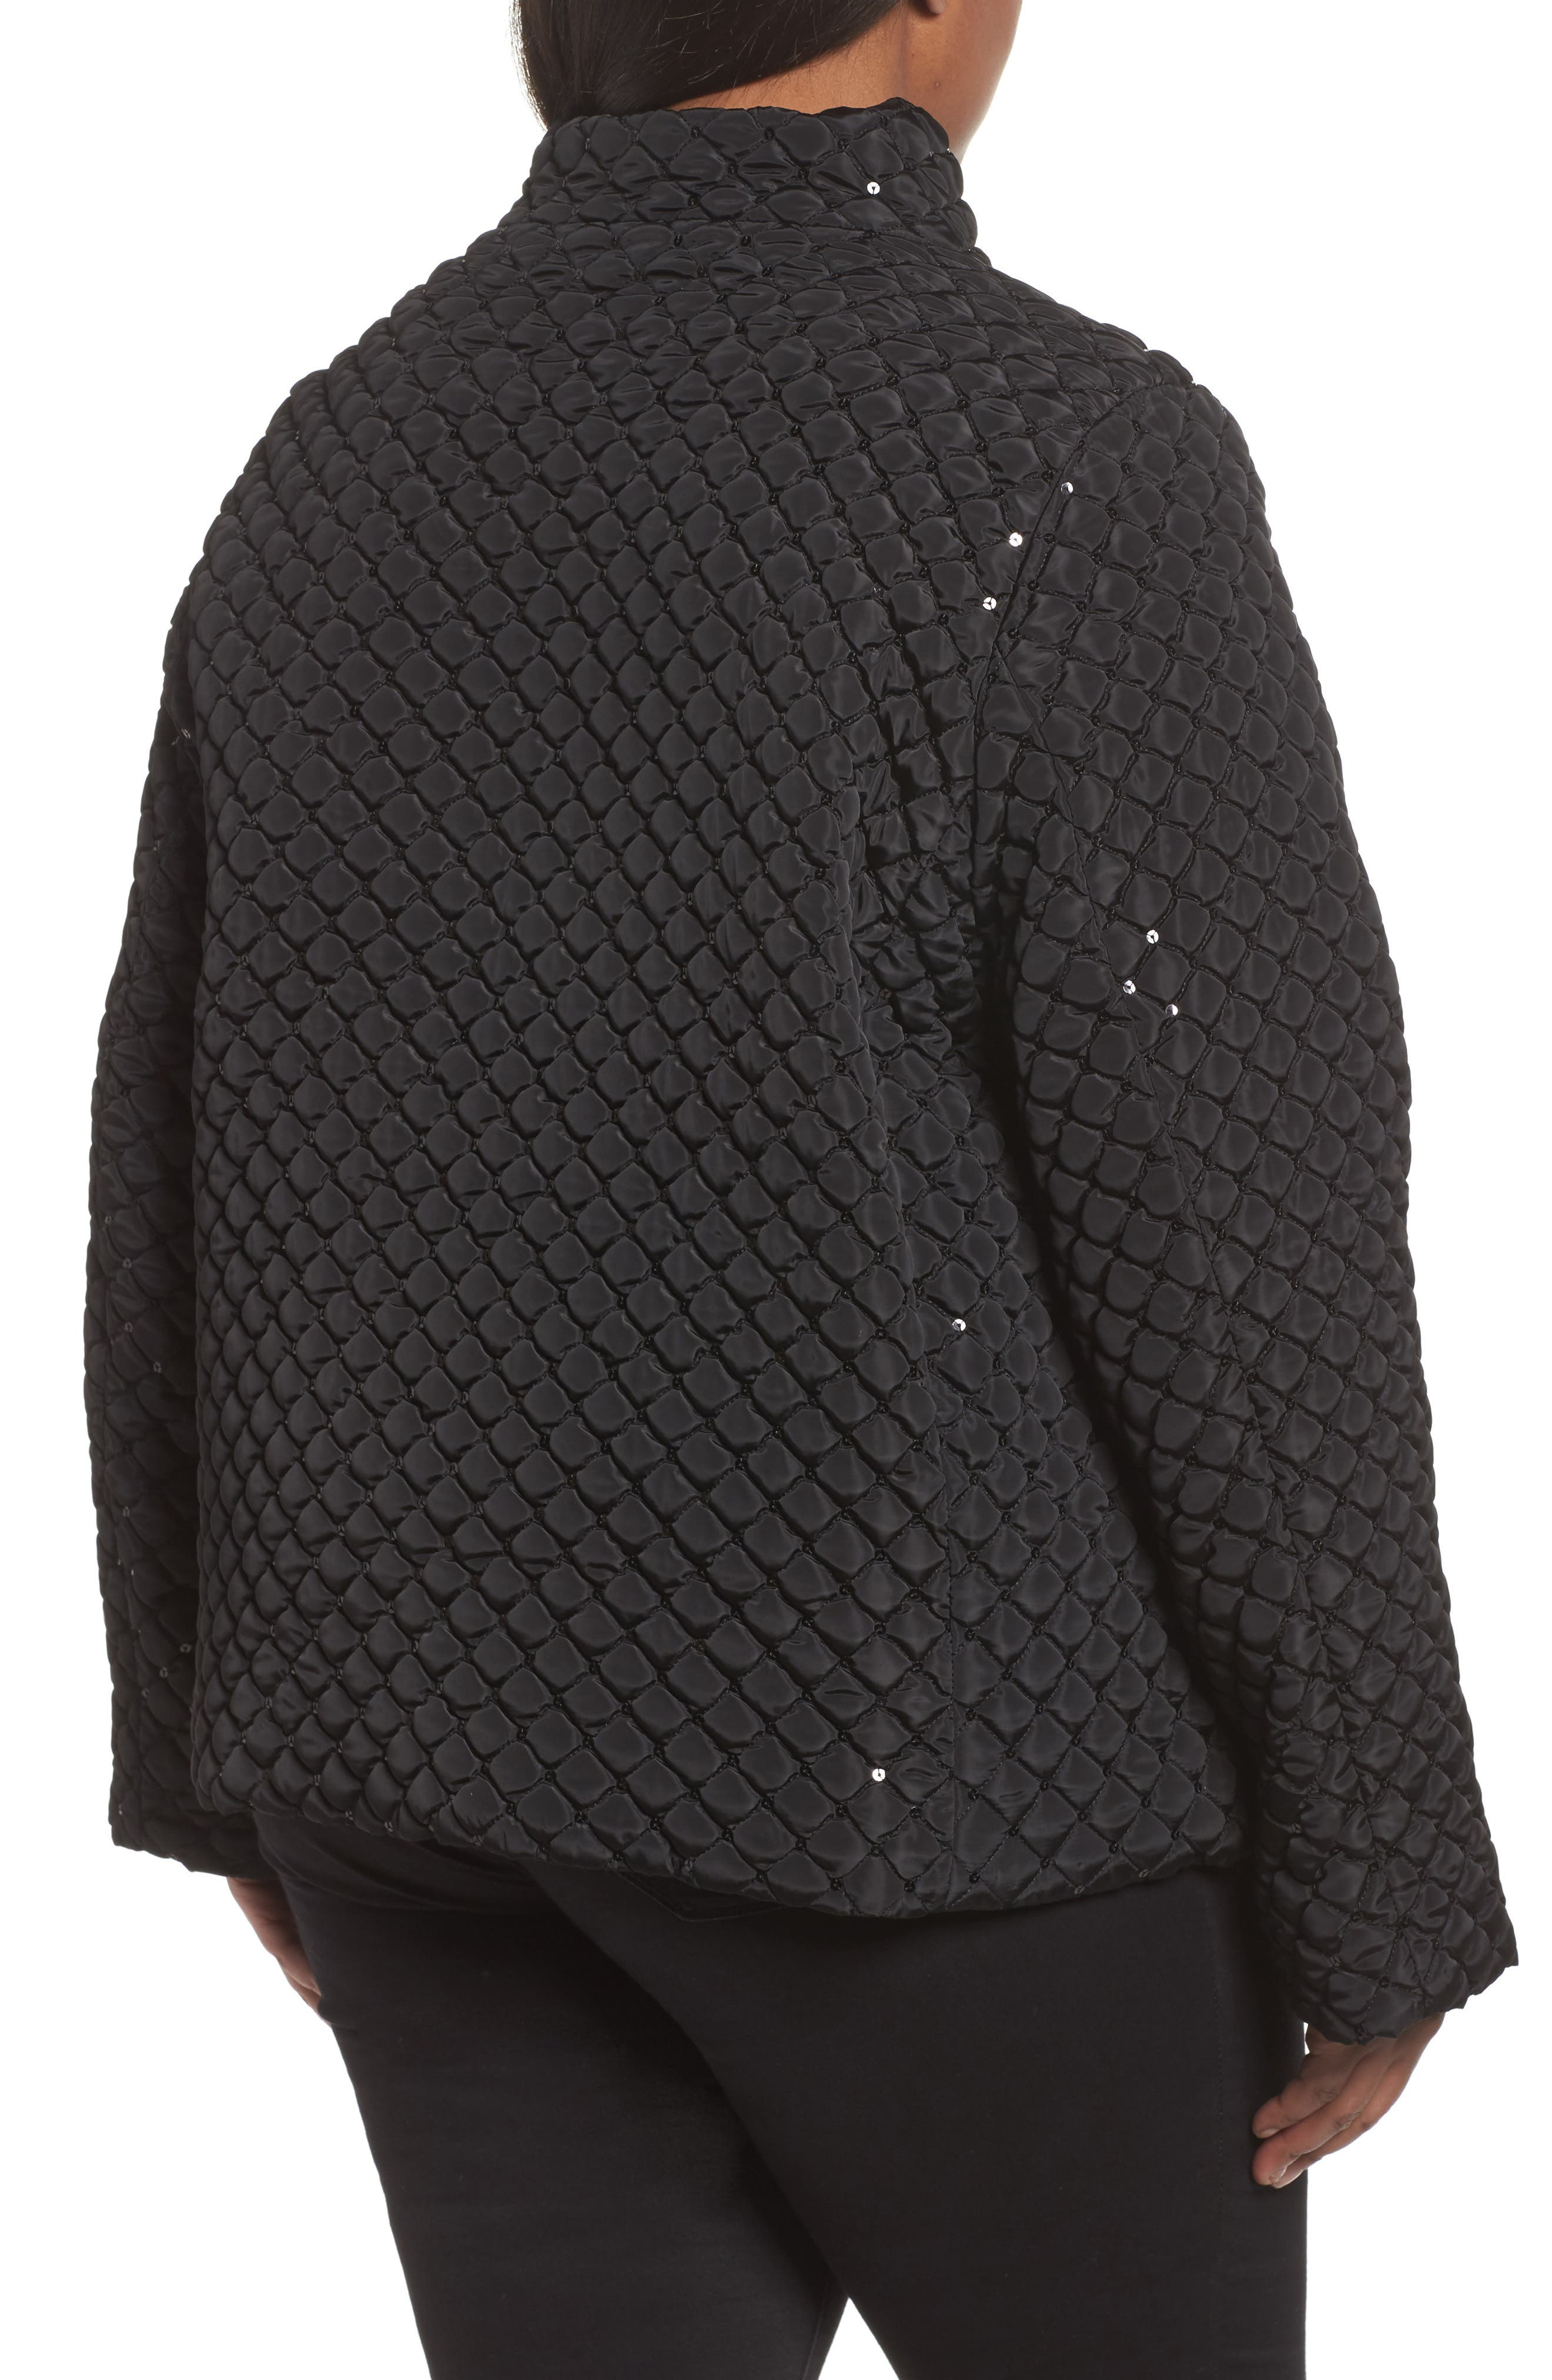 Papaia Sequin Jacket,                             Alternate thumbnail 2, color,                             001